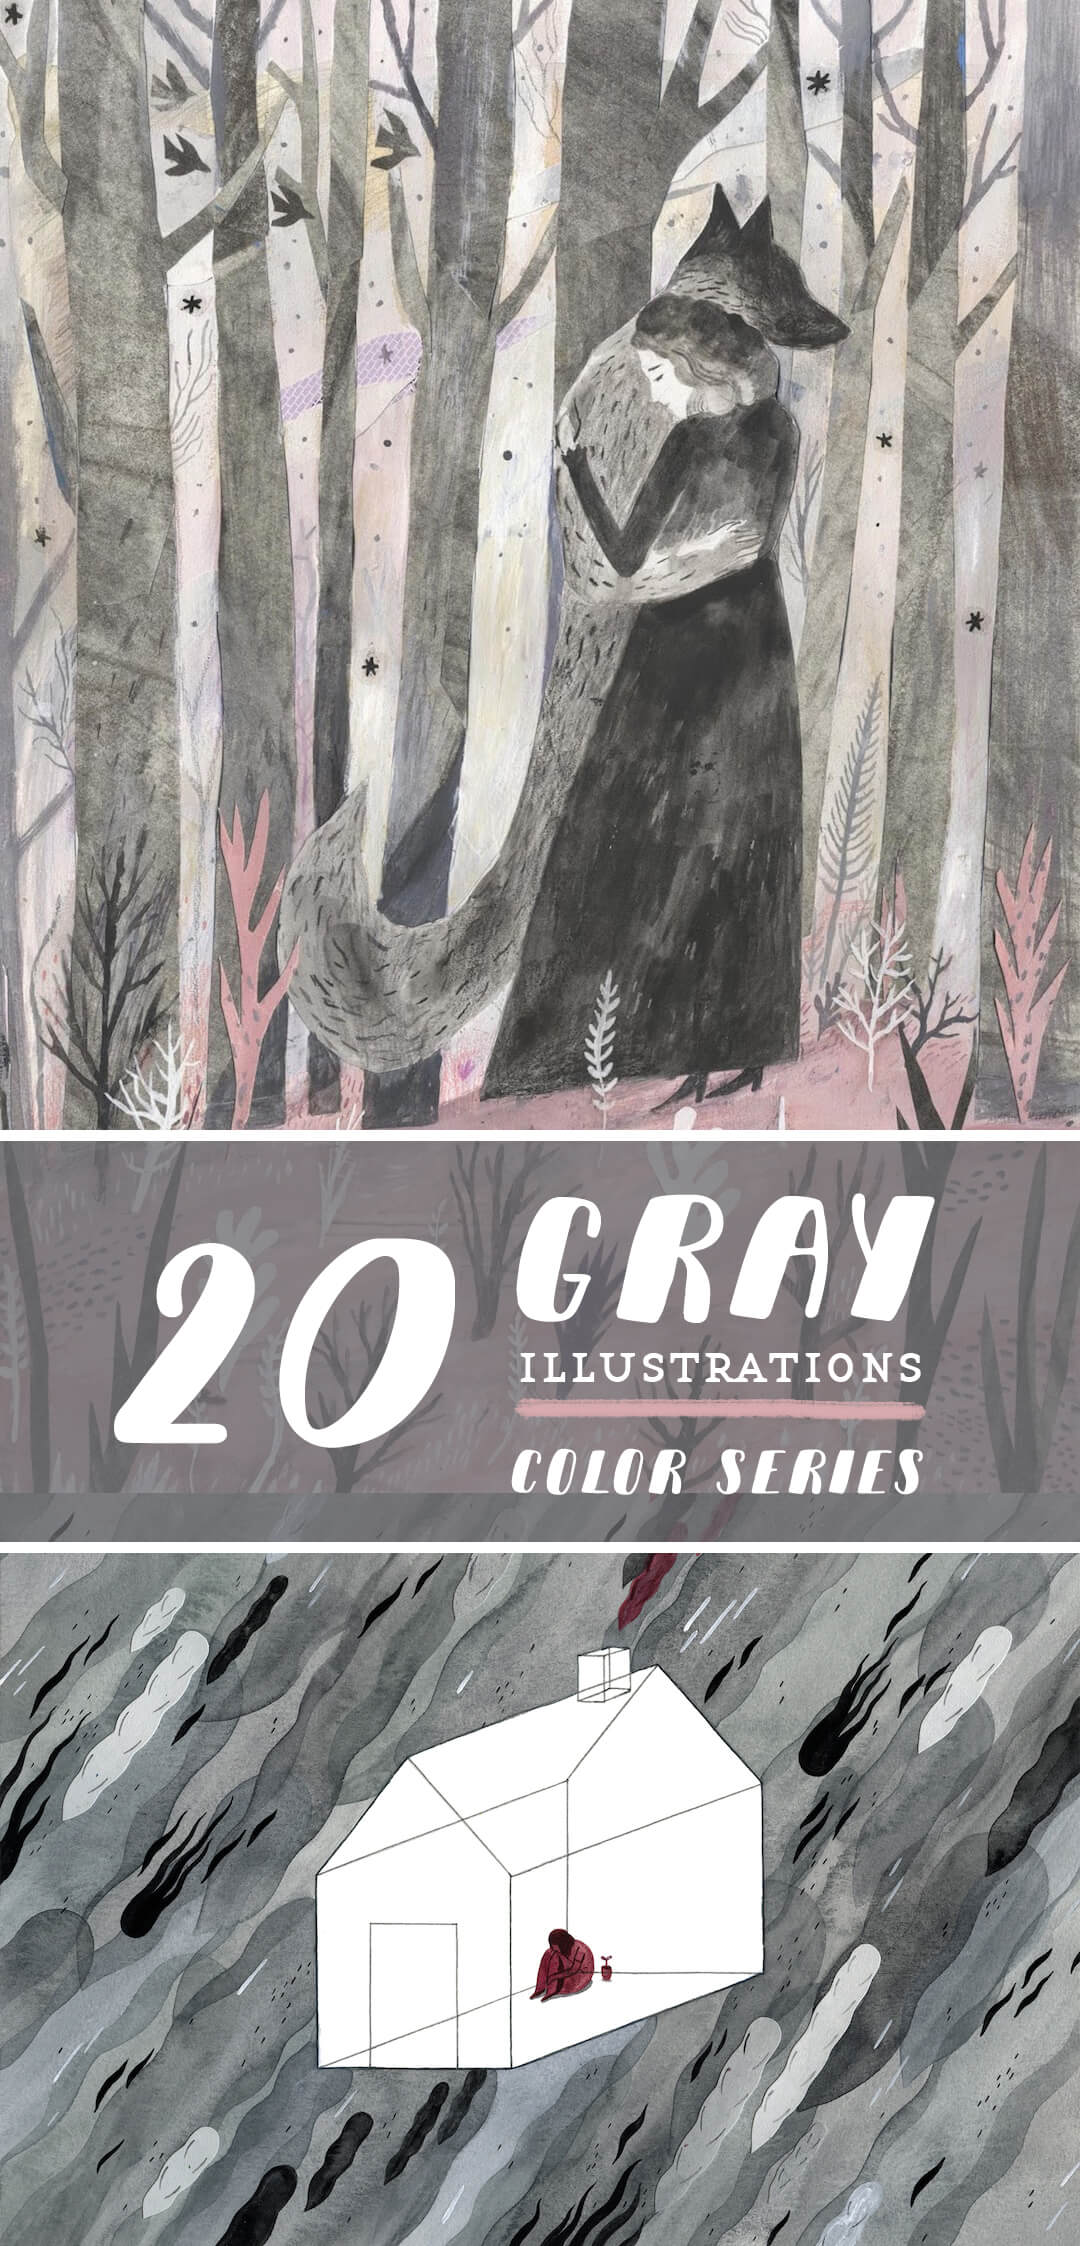 Gray illustrations